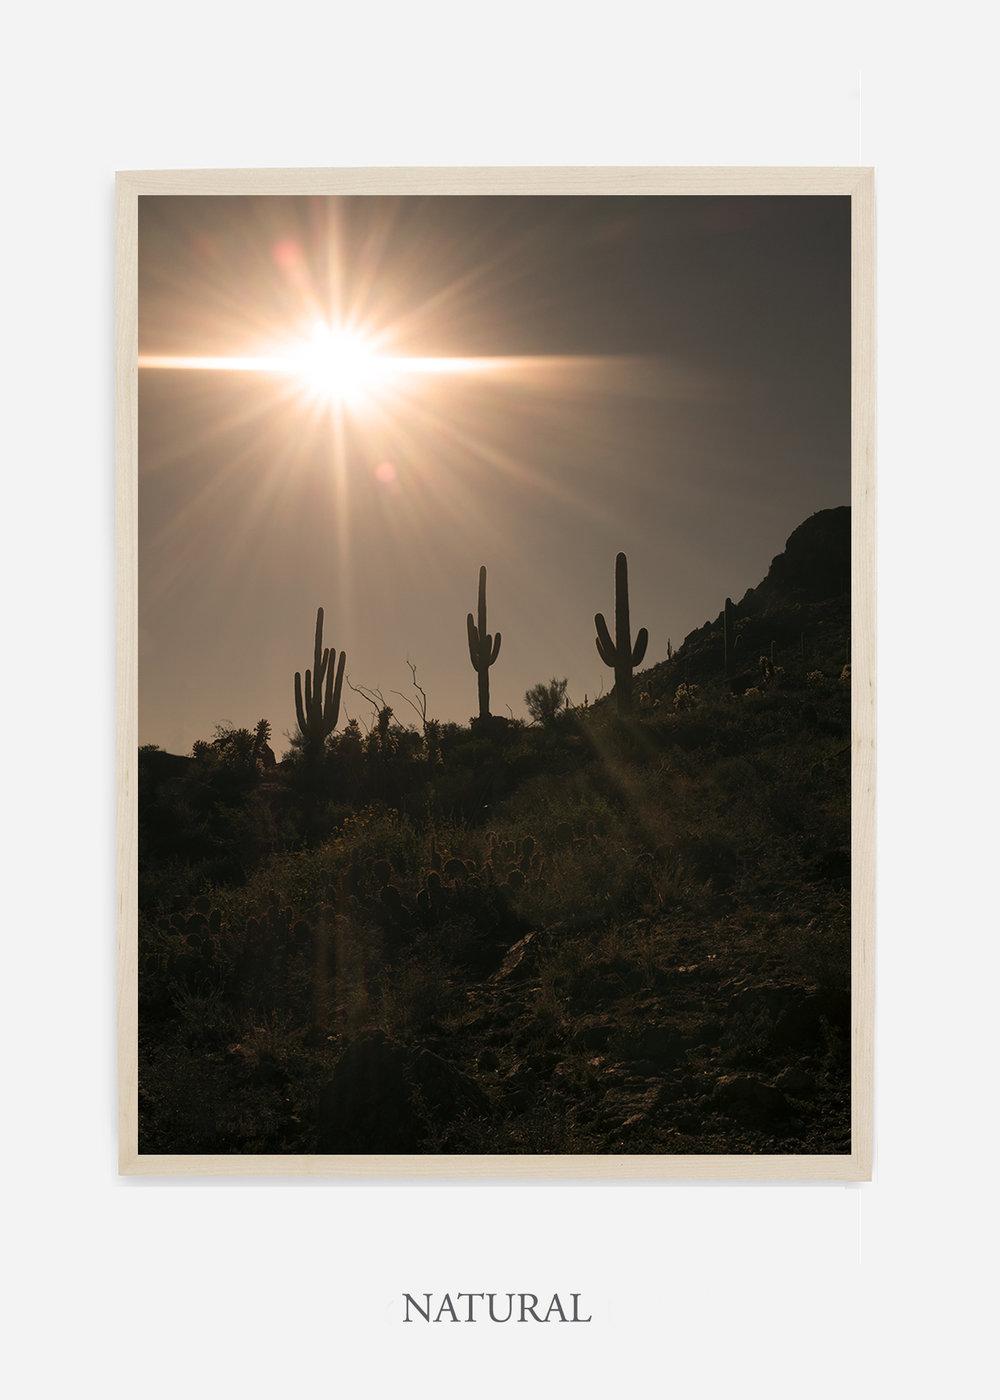 nomat-naturalframe-saguaroNo.16-wildercalifornia-art-wallart-cactusprint-homedecor-prints-arizona-botanical-artwork-interiordesign.jpg